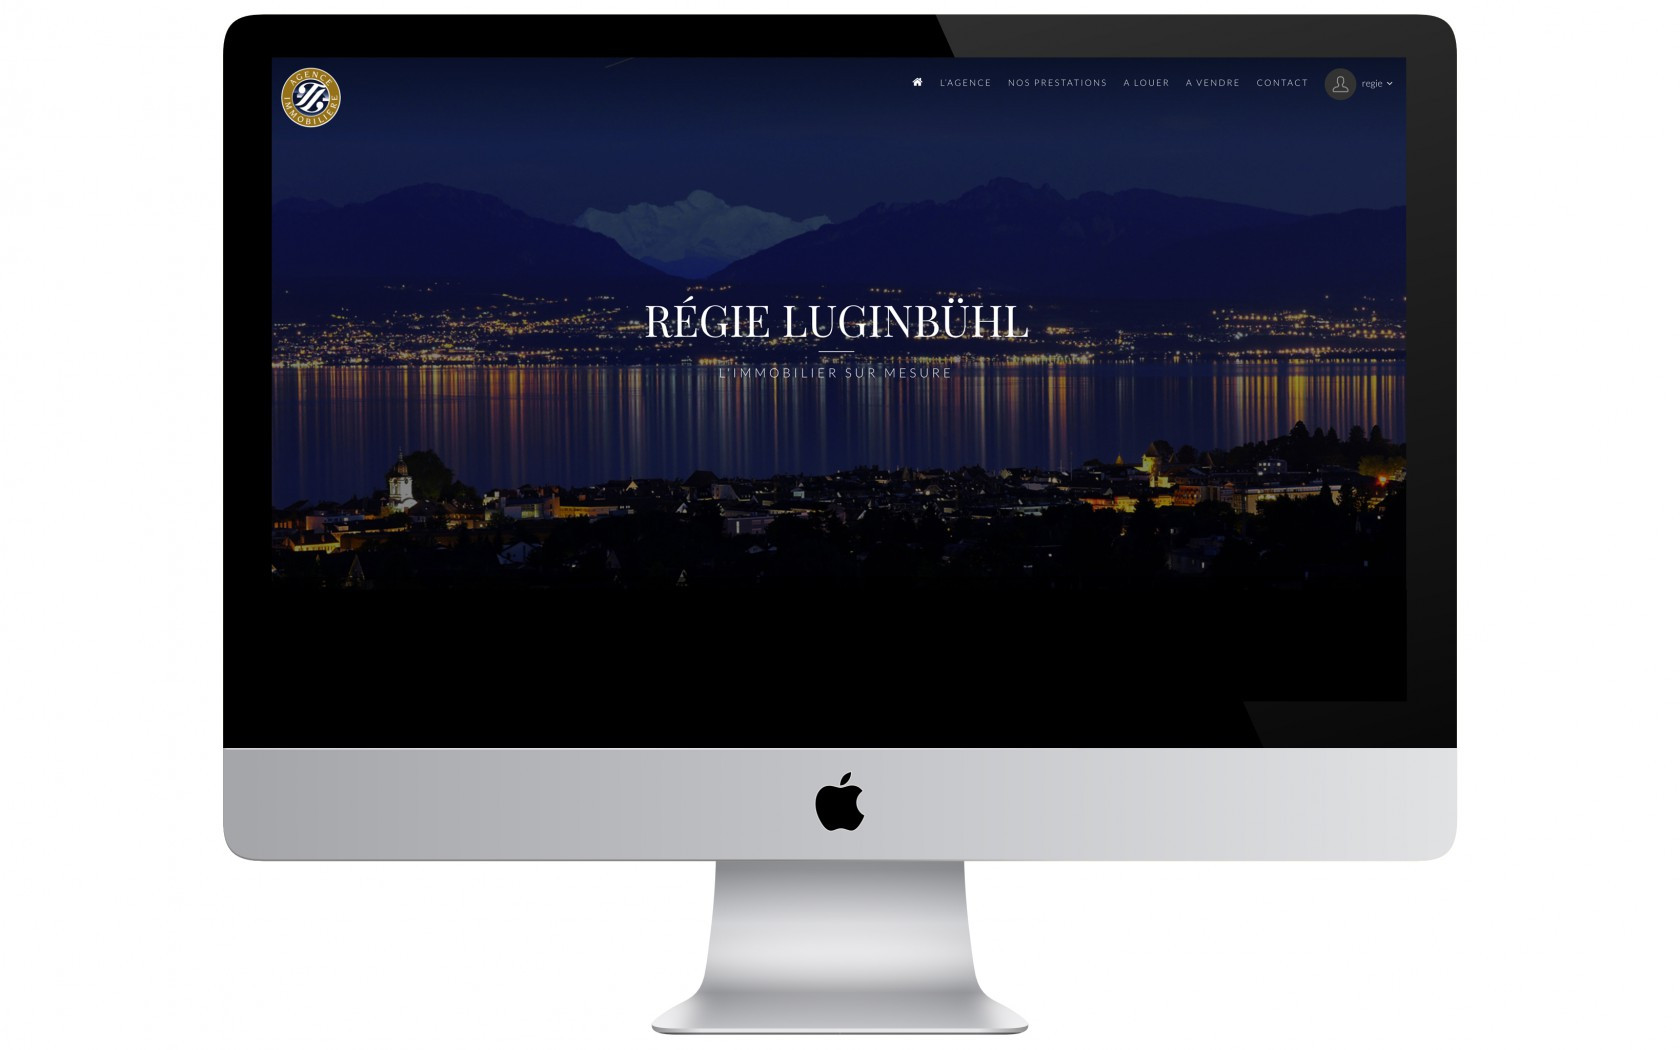 site-ril-1-1680x1050.jpg